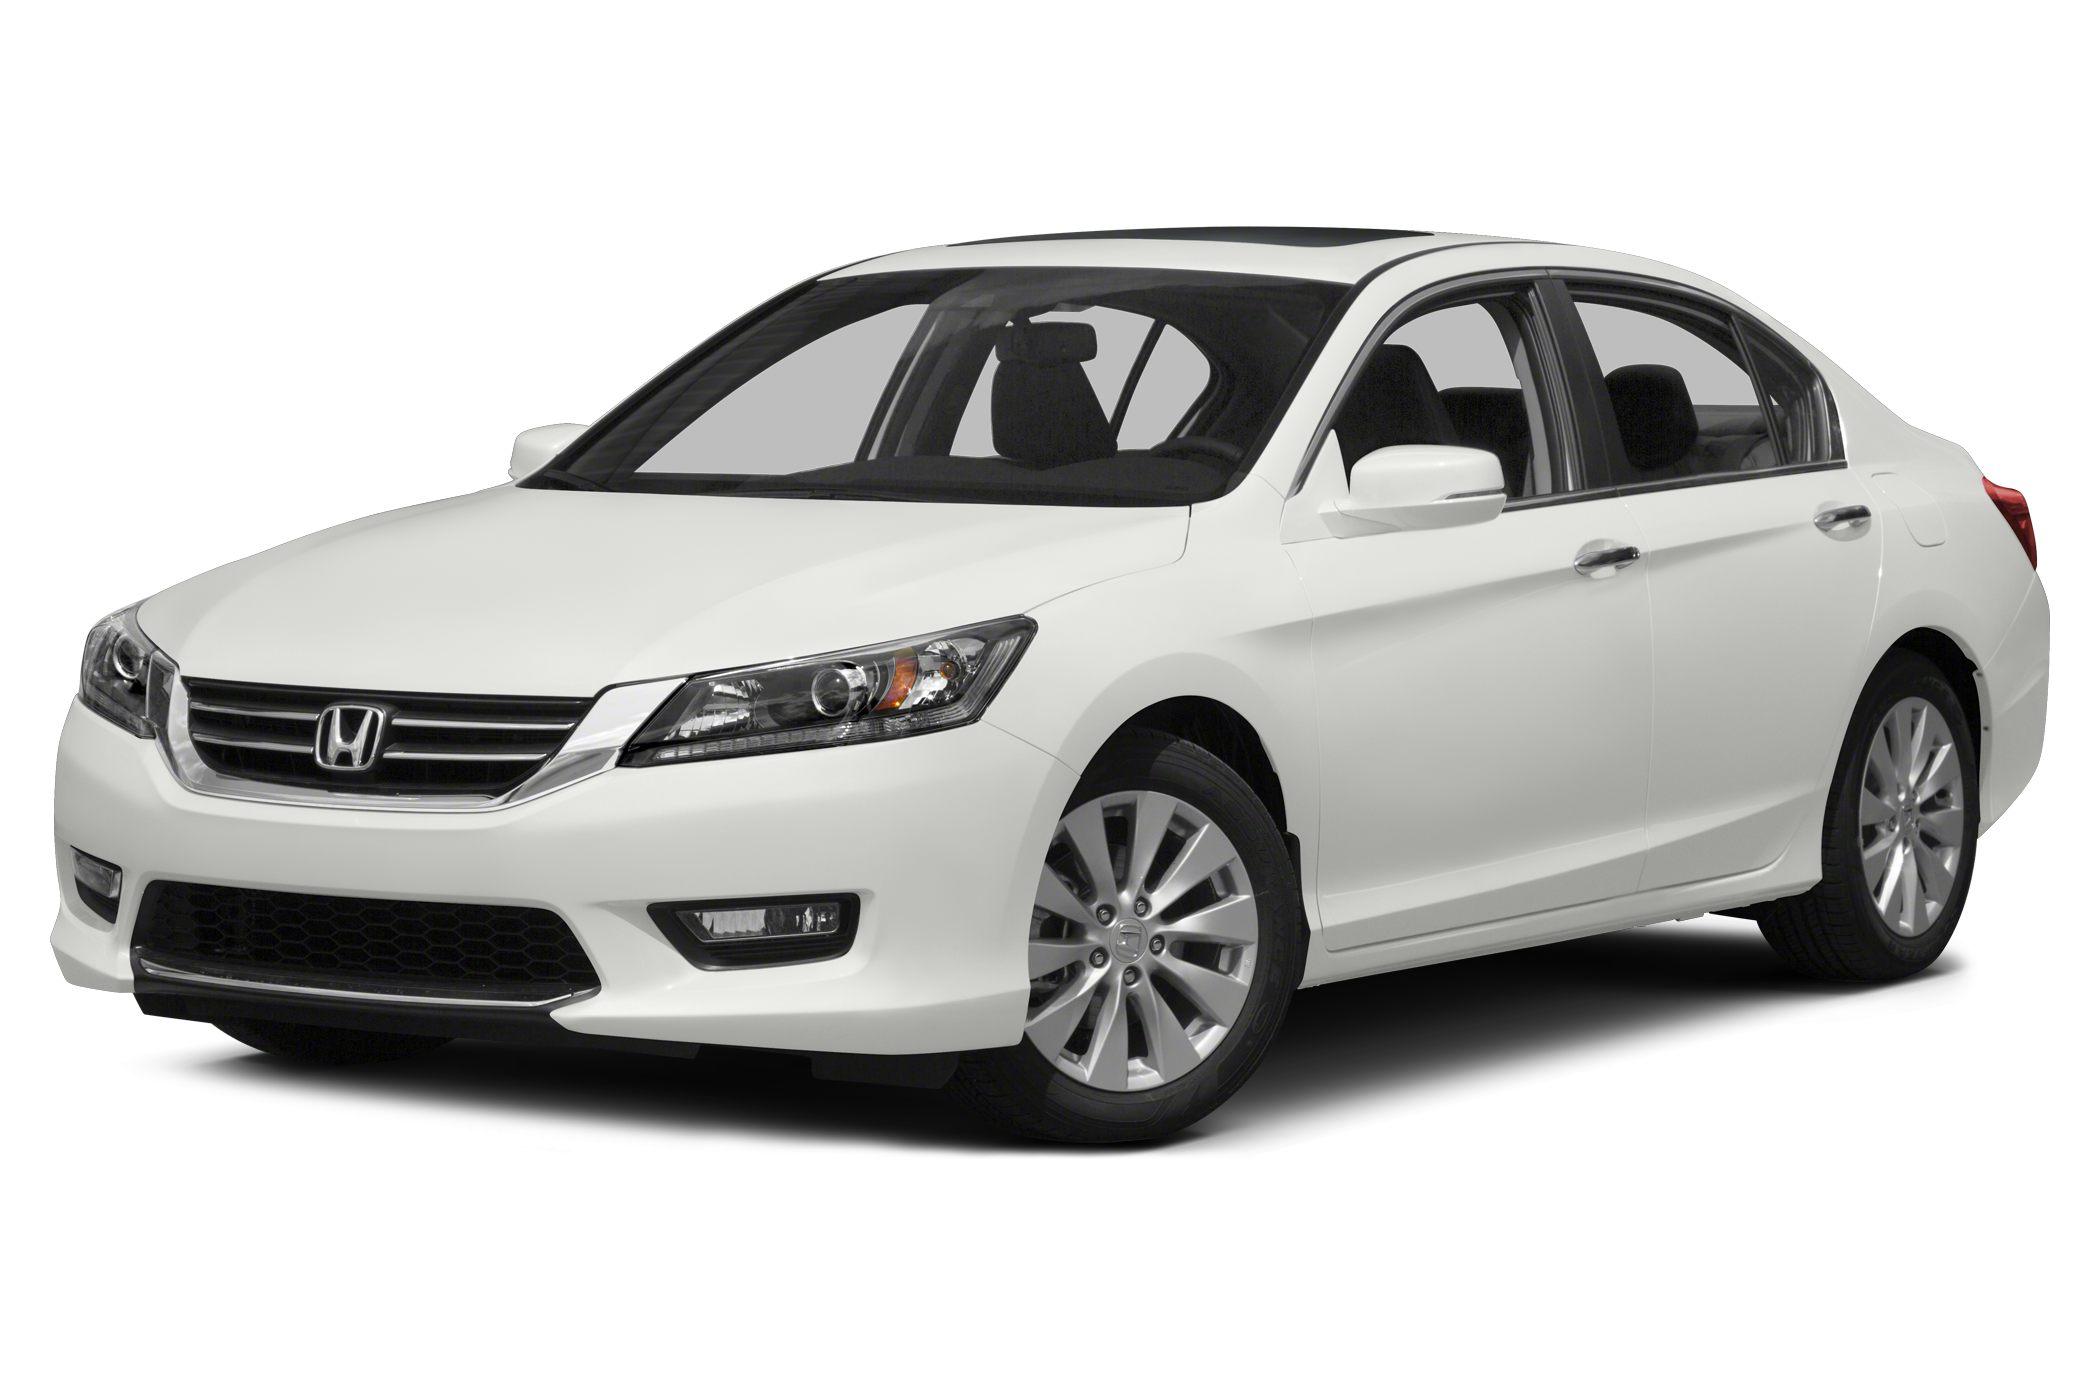 Honda Accord Ex L >> 2014 Honda Accord Ex L 4dr Sedan Pictures